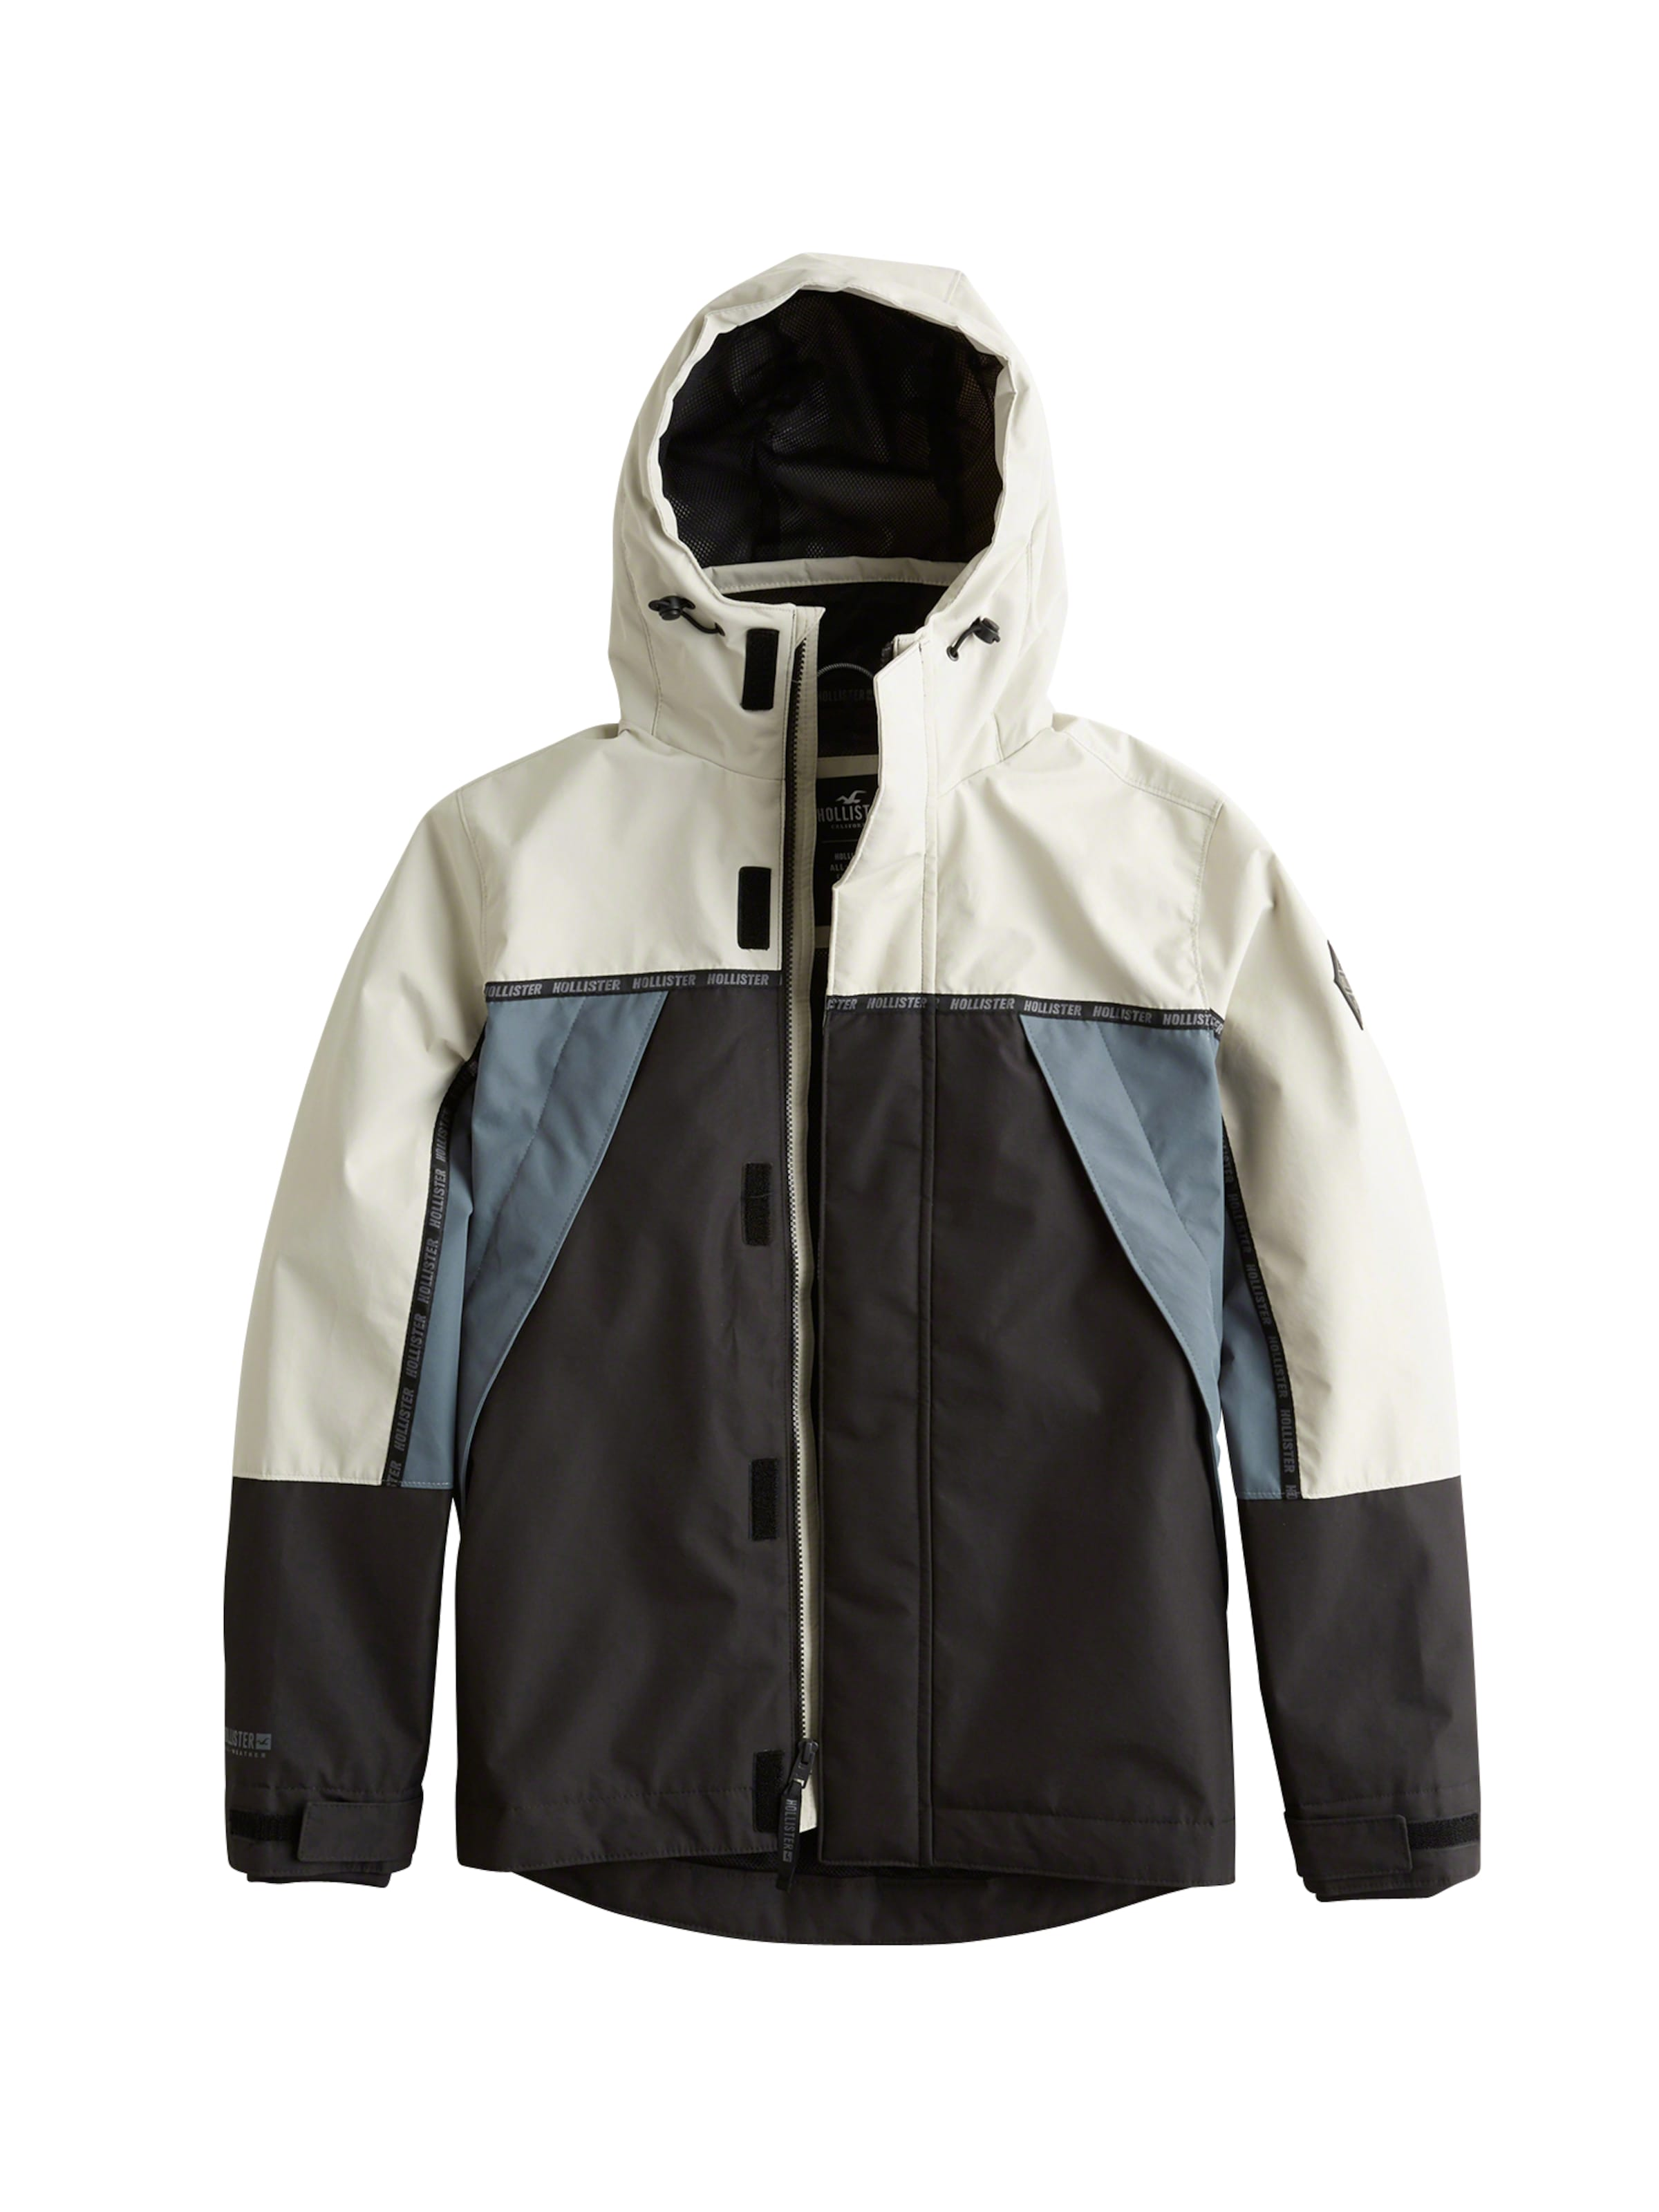 Jacke In Jacket' Hollister 'aw CremeBlau Schwarz Shell 8mnwNOyv0